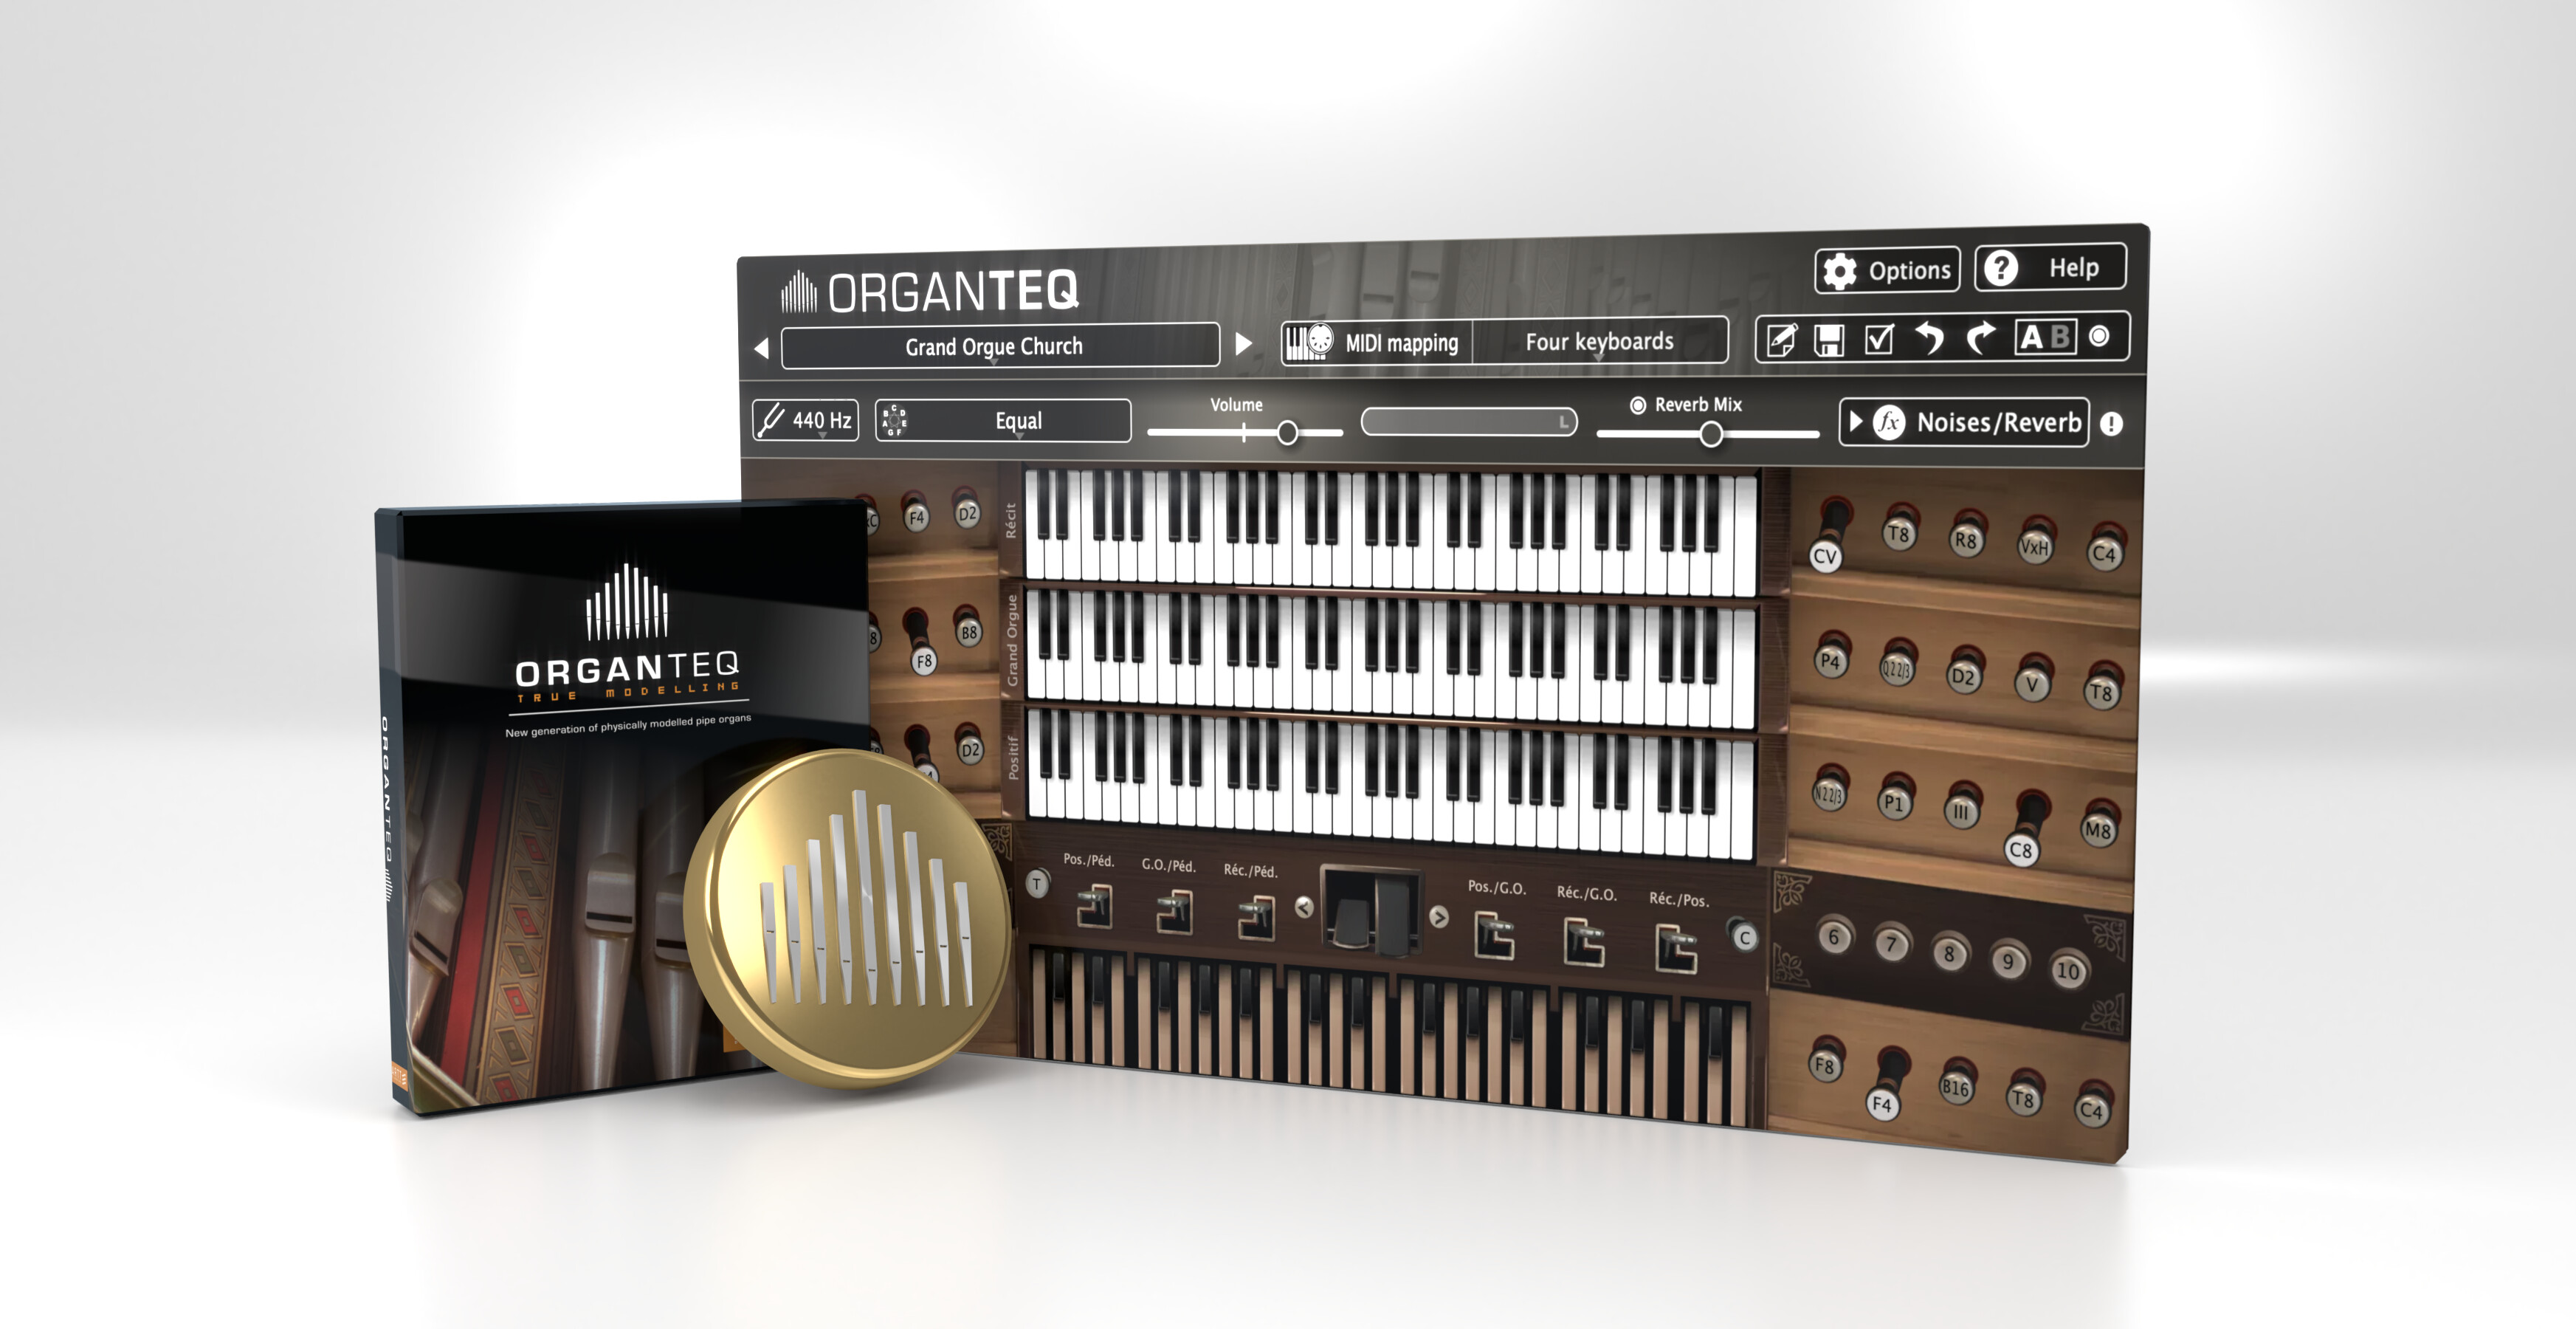 Organteq by MODARTT